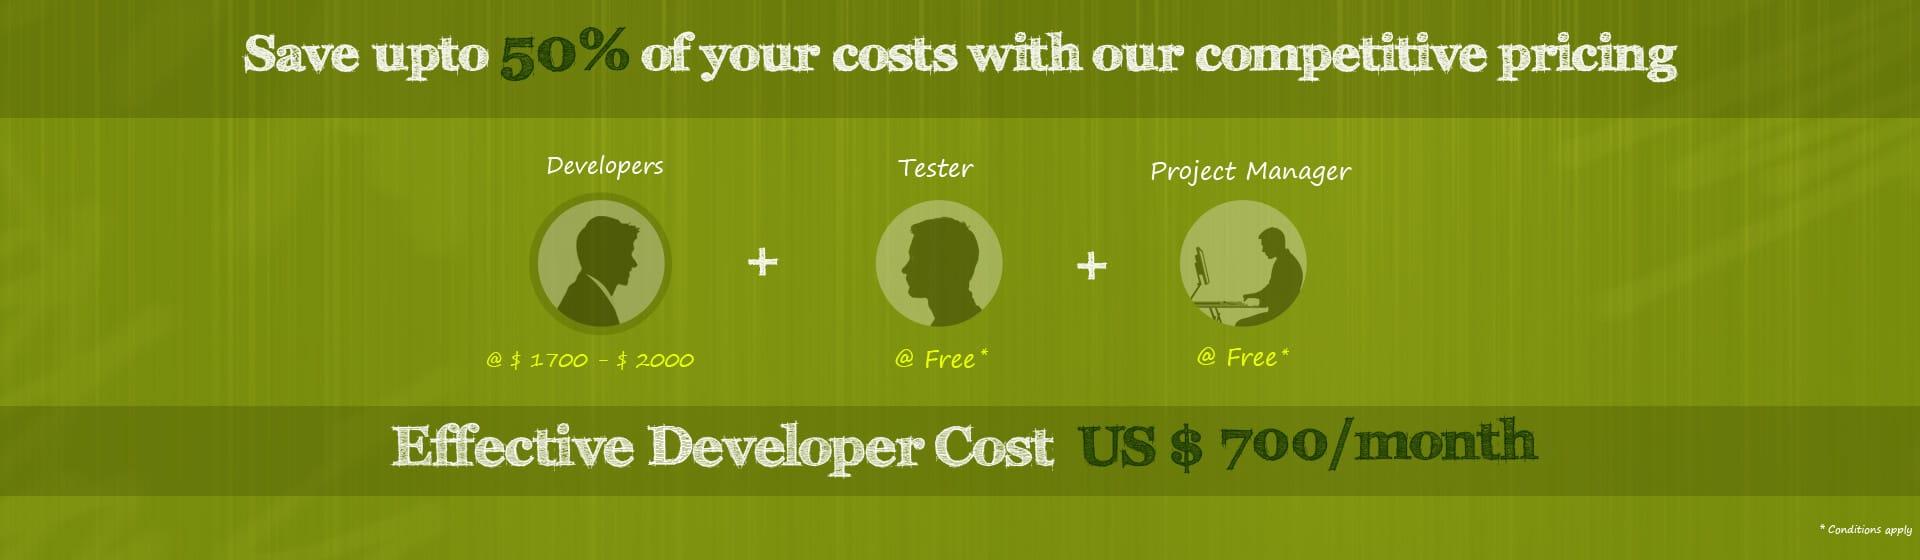 Need Developers